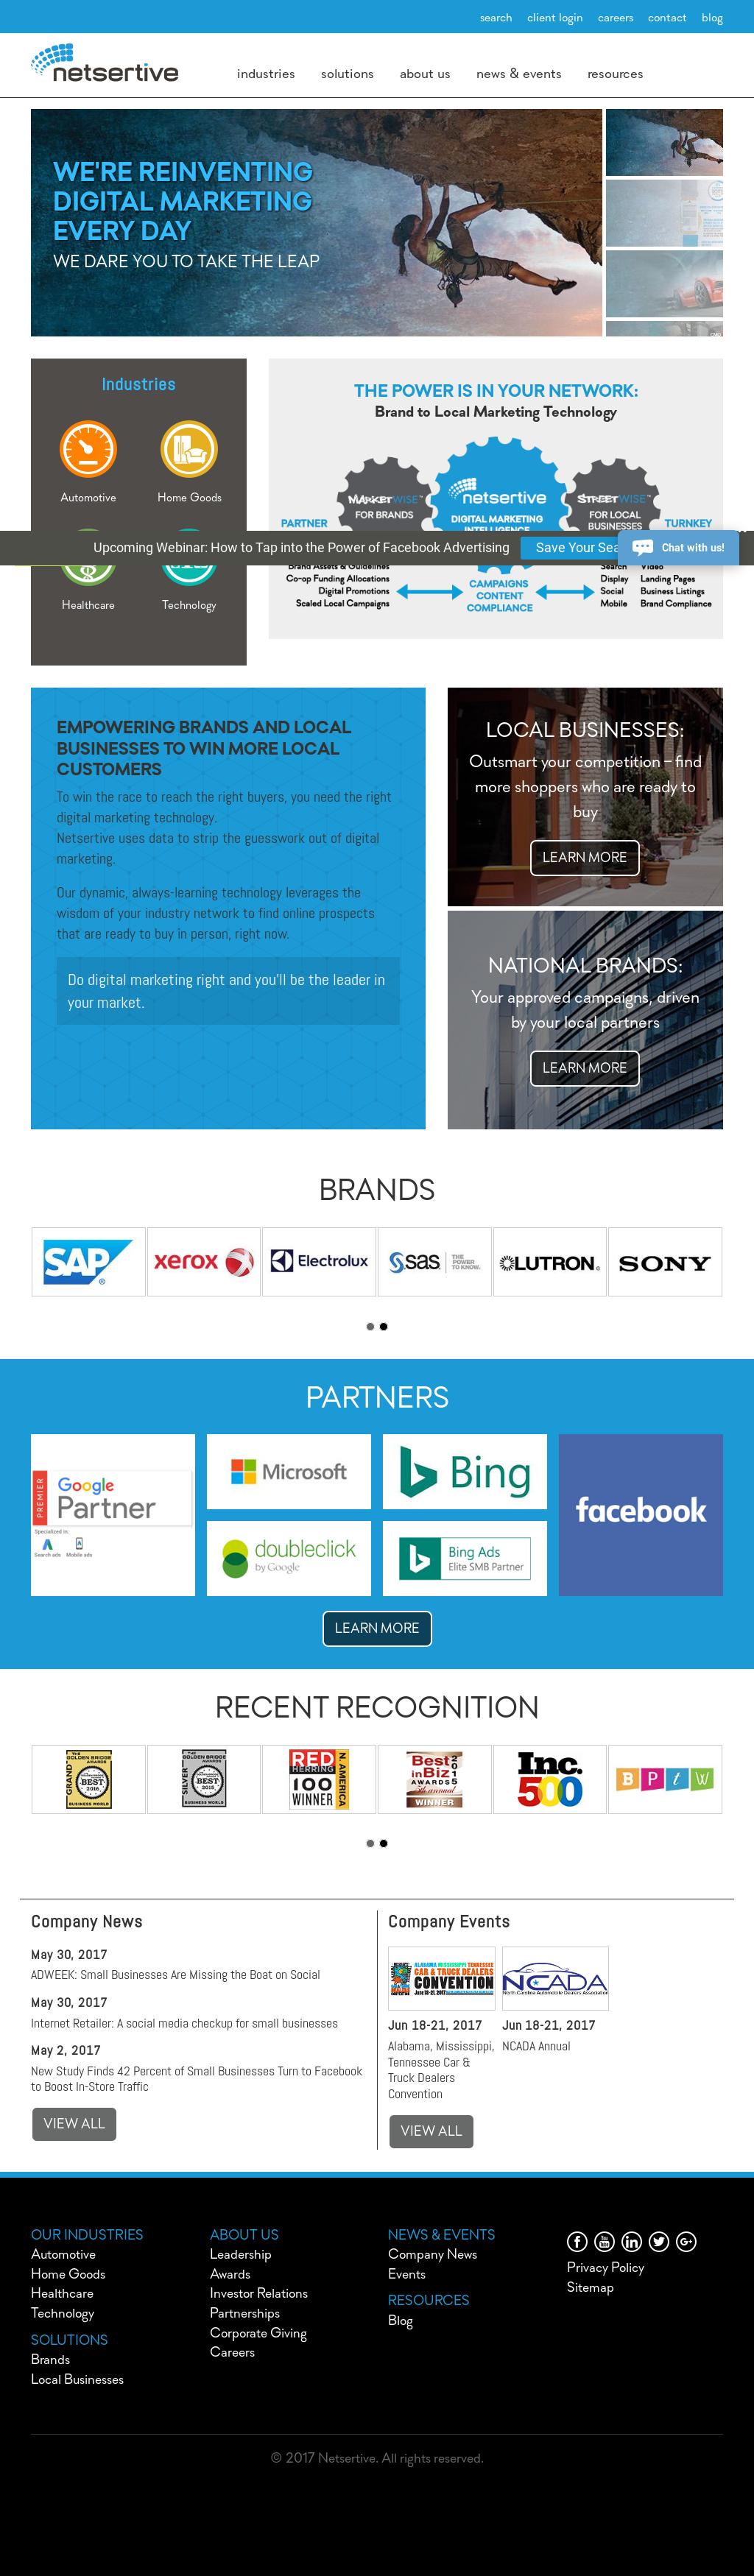 Netsertive Competitors, Revenue and Employees - Owler Company Profile